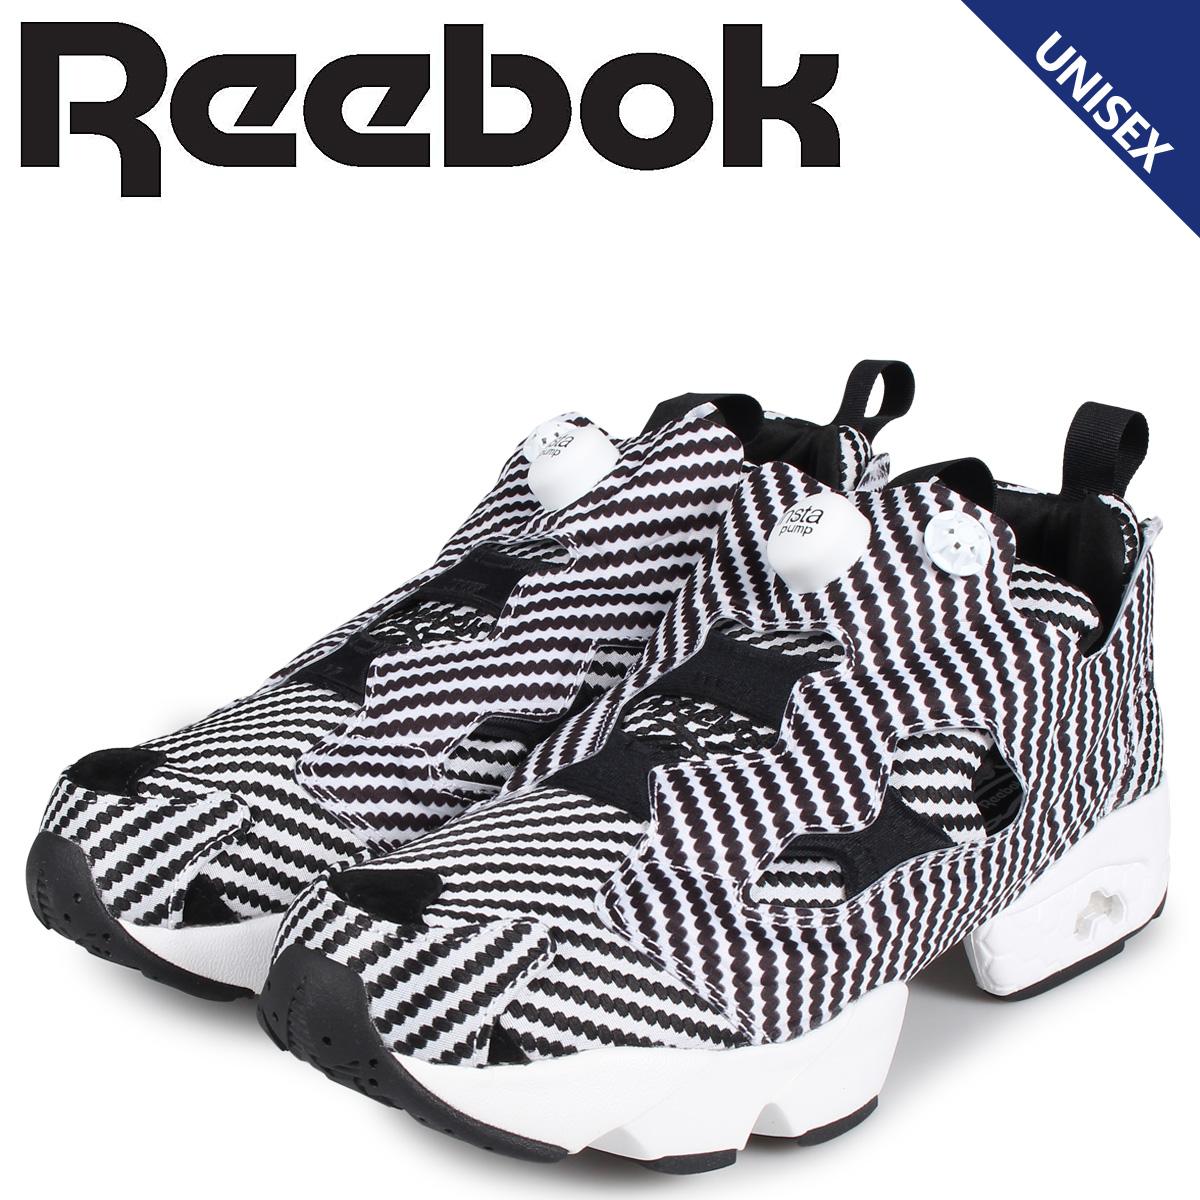 Reebok リーボック インスタ ポンプフューリー スニーカー メンズ レディース INSTAPUMP FURY OG CF ブラック 黒 DV7305